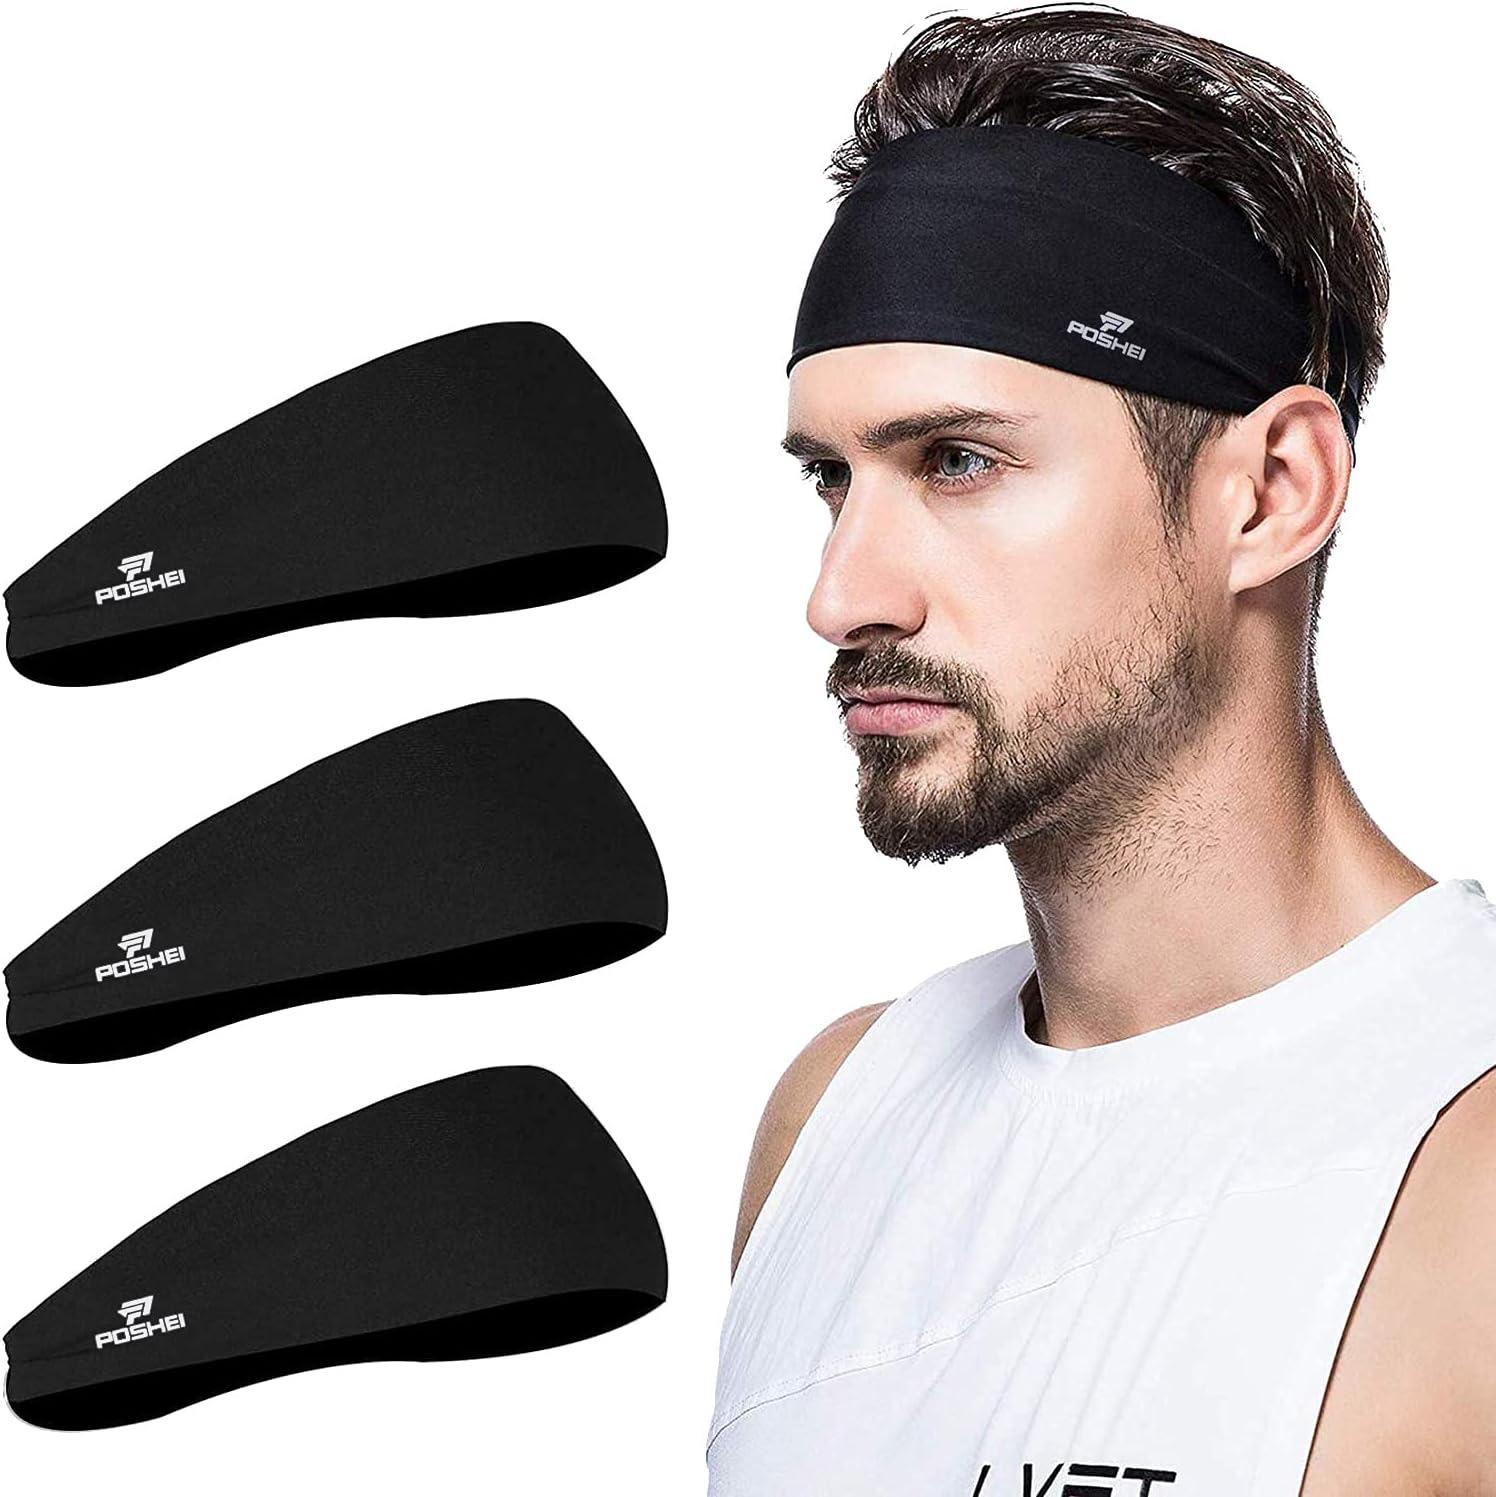 poshei Mens Headband, Mens Sweatband & Sports Headband for Running,Cycling, Yoga, Basketball - Stretchy Moisture Wicking Unisex Hairband: Shoes